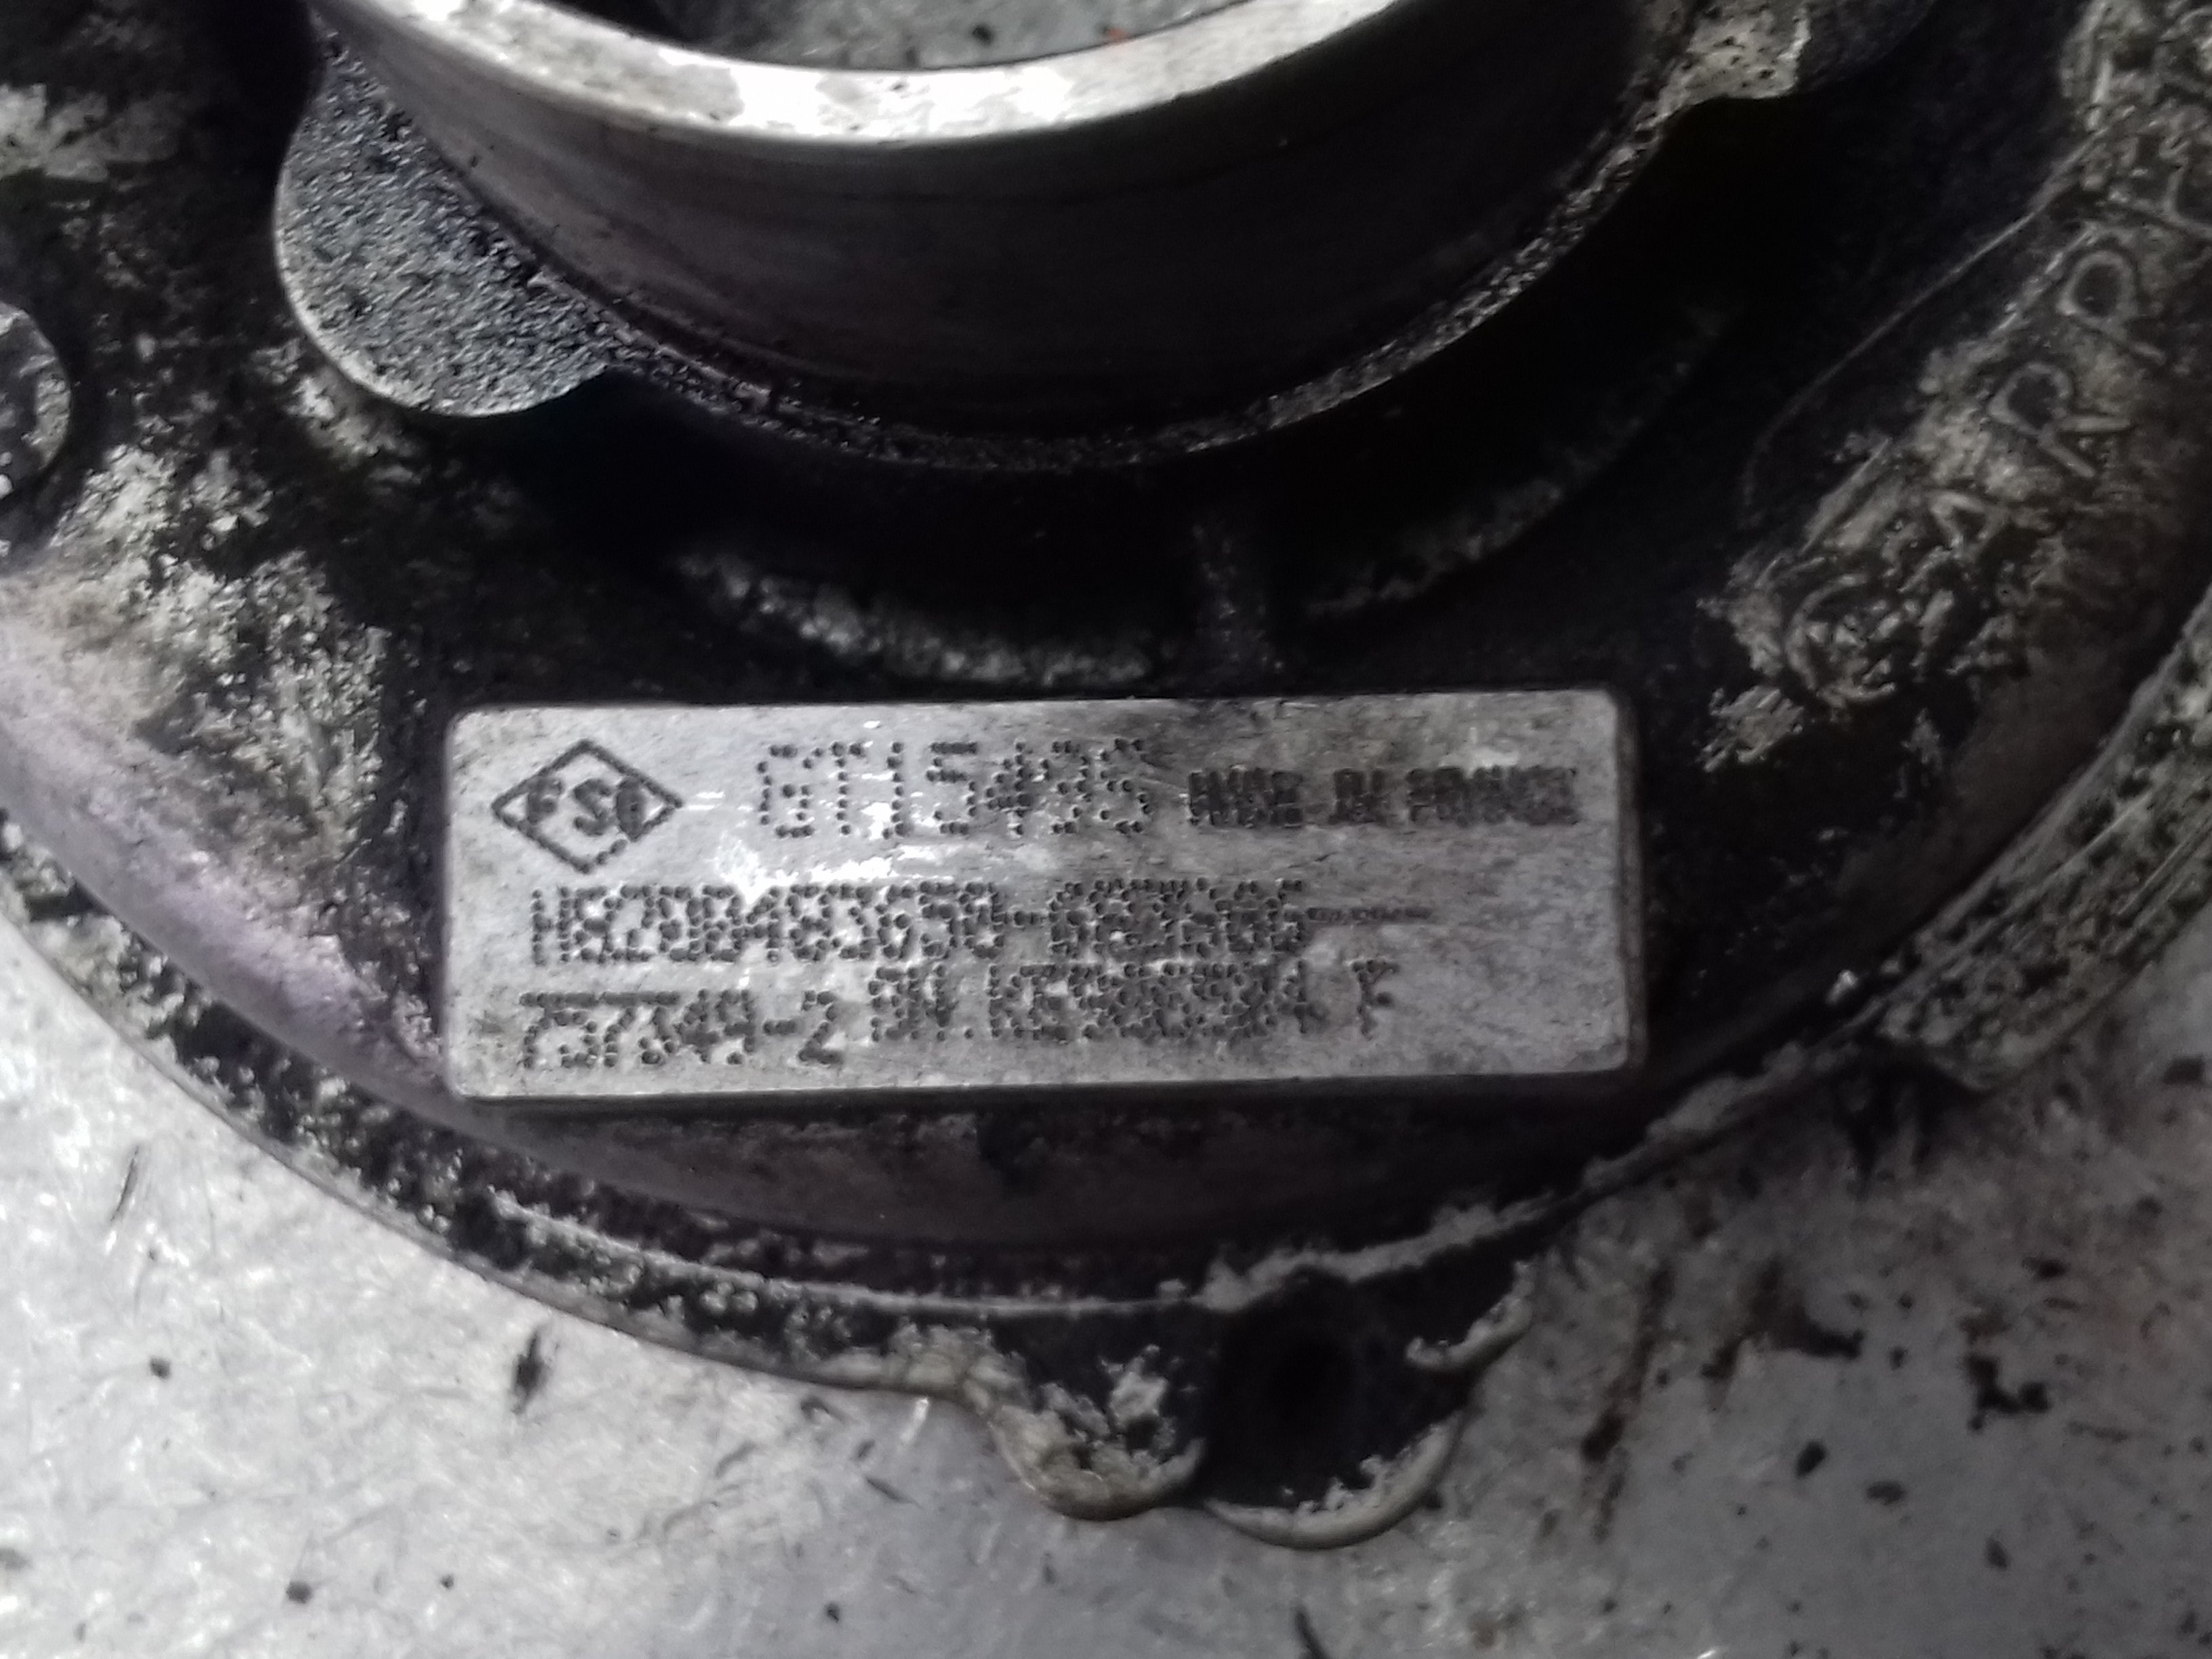 Renault Master, рено мастер, ремонт турбины, 757349-2